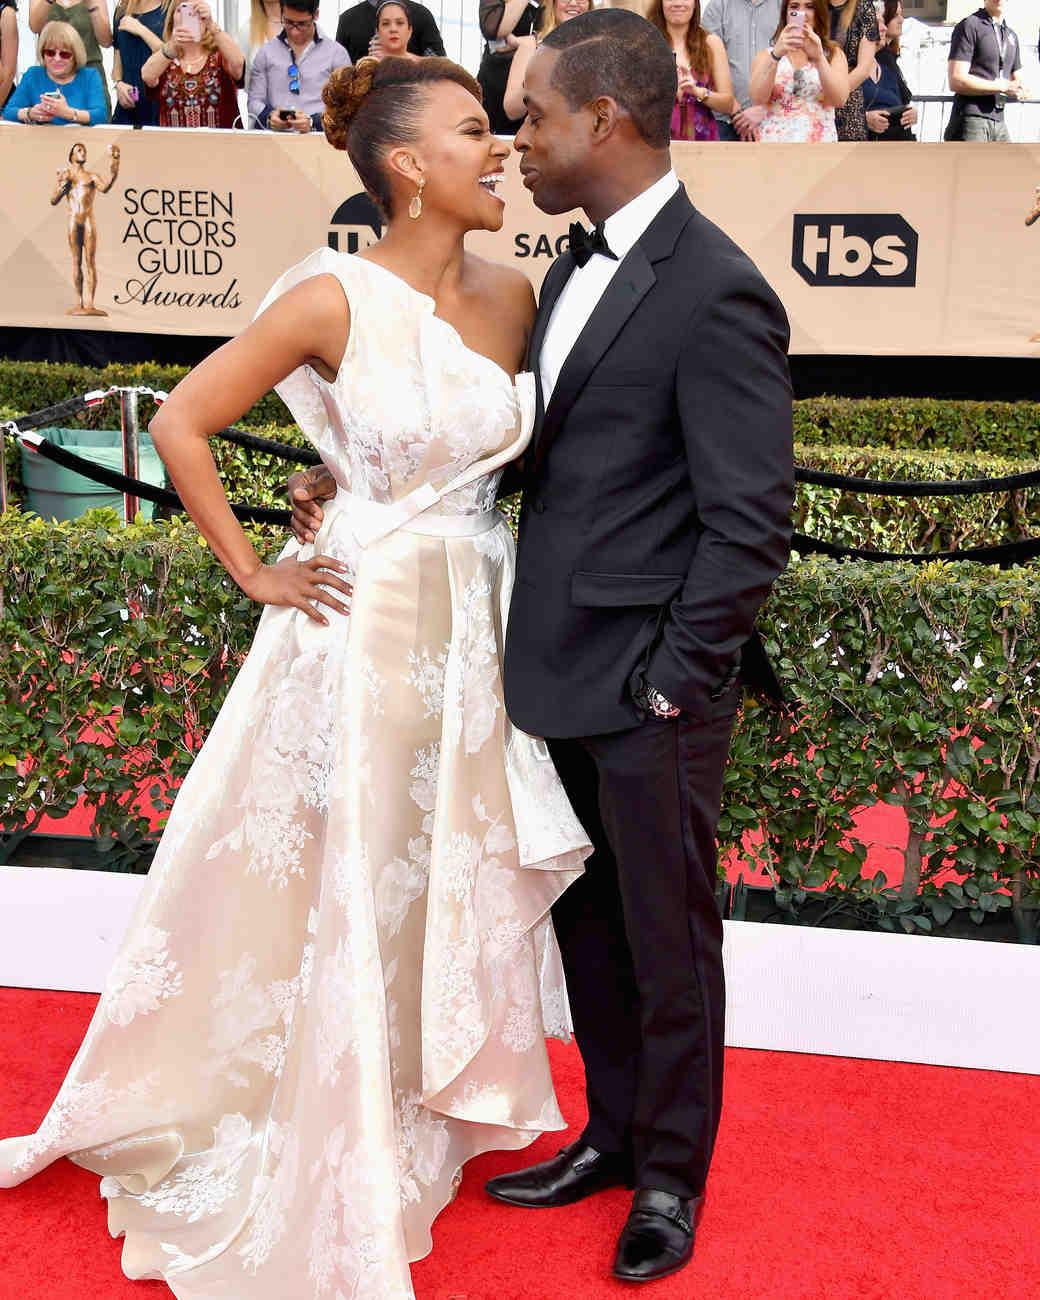 Sterling K Brown and Ryan Michelle Bathe Sag Awards 2017